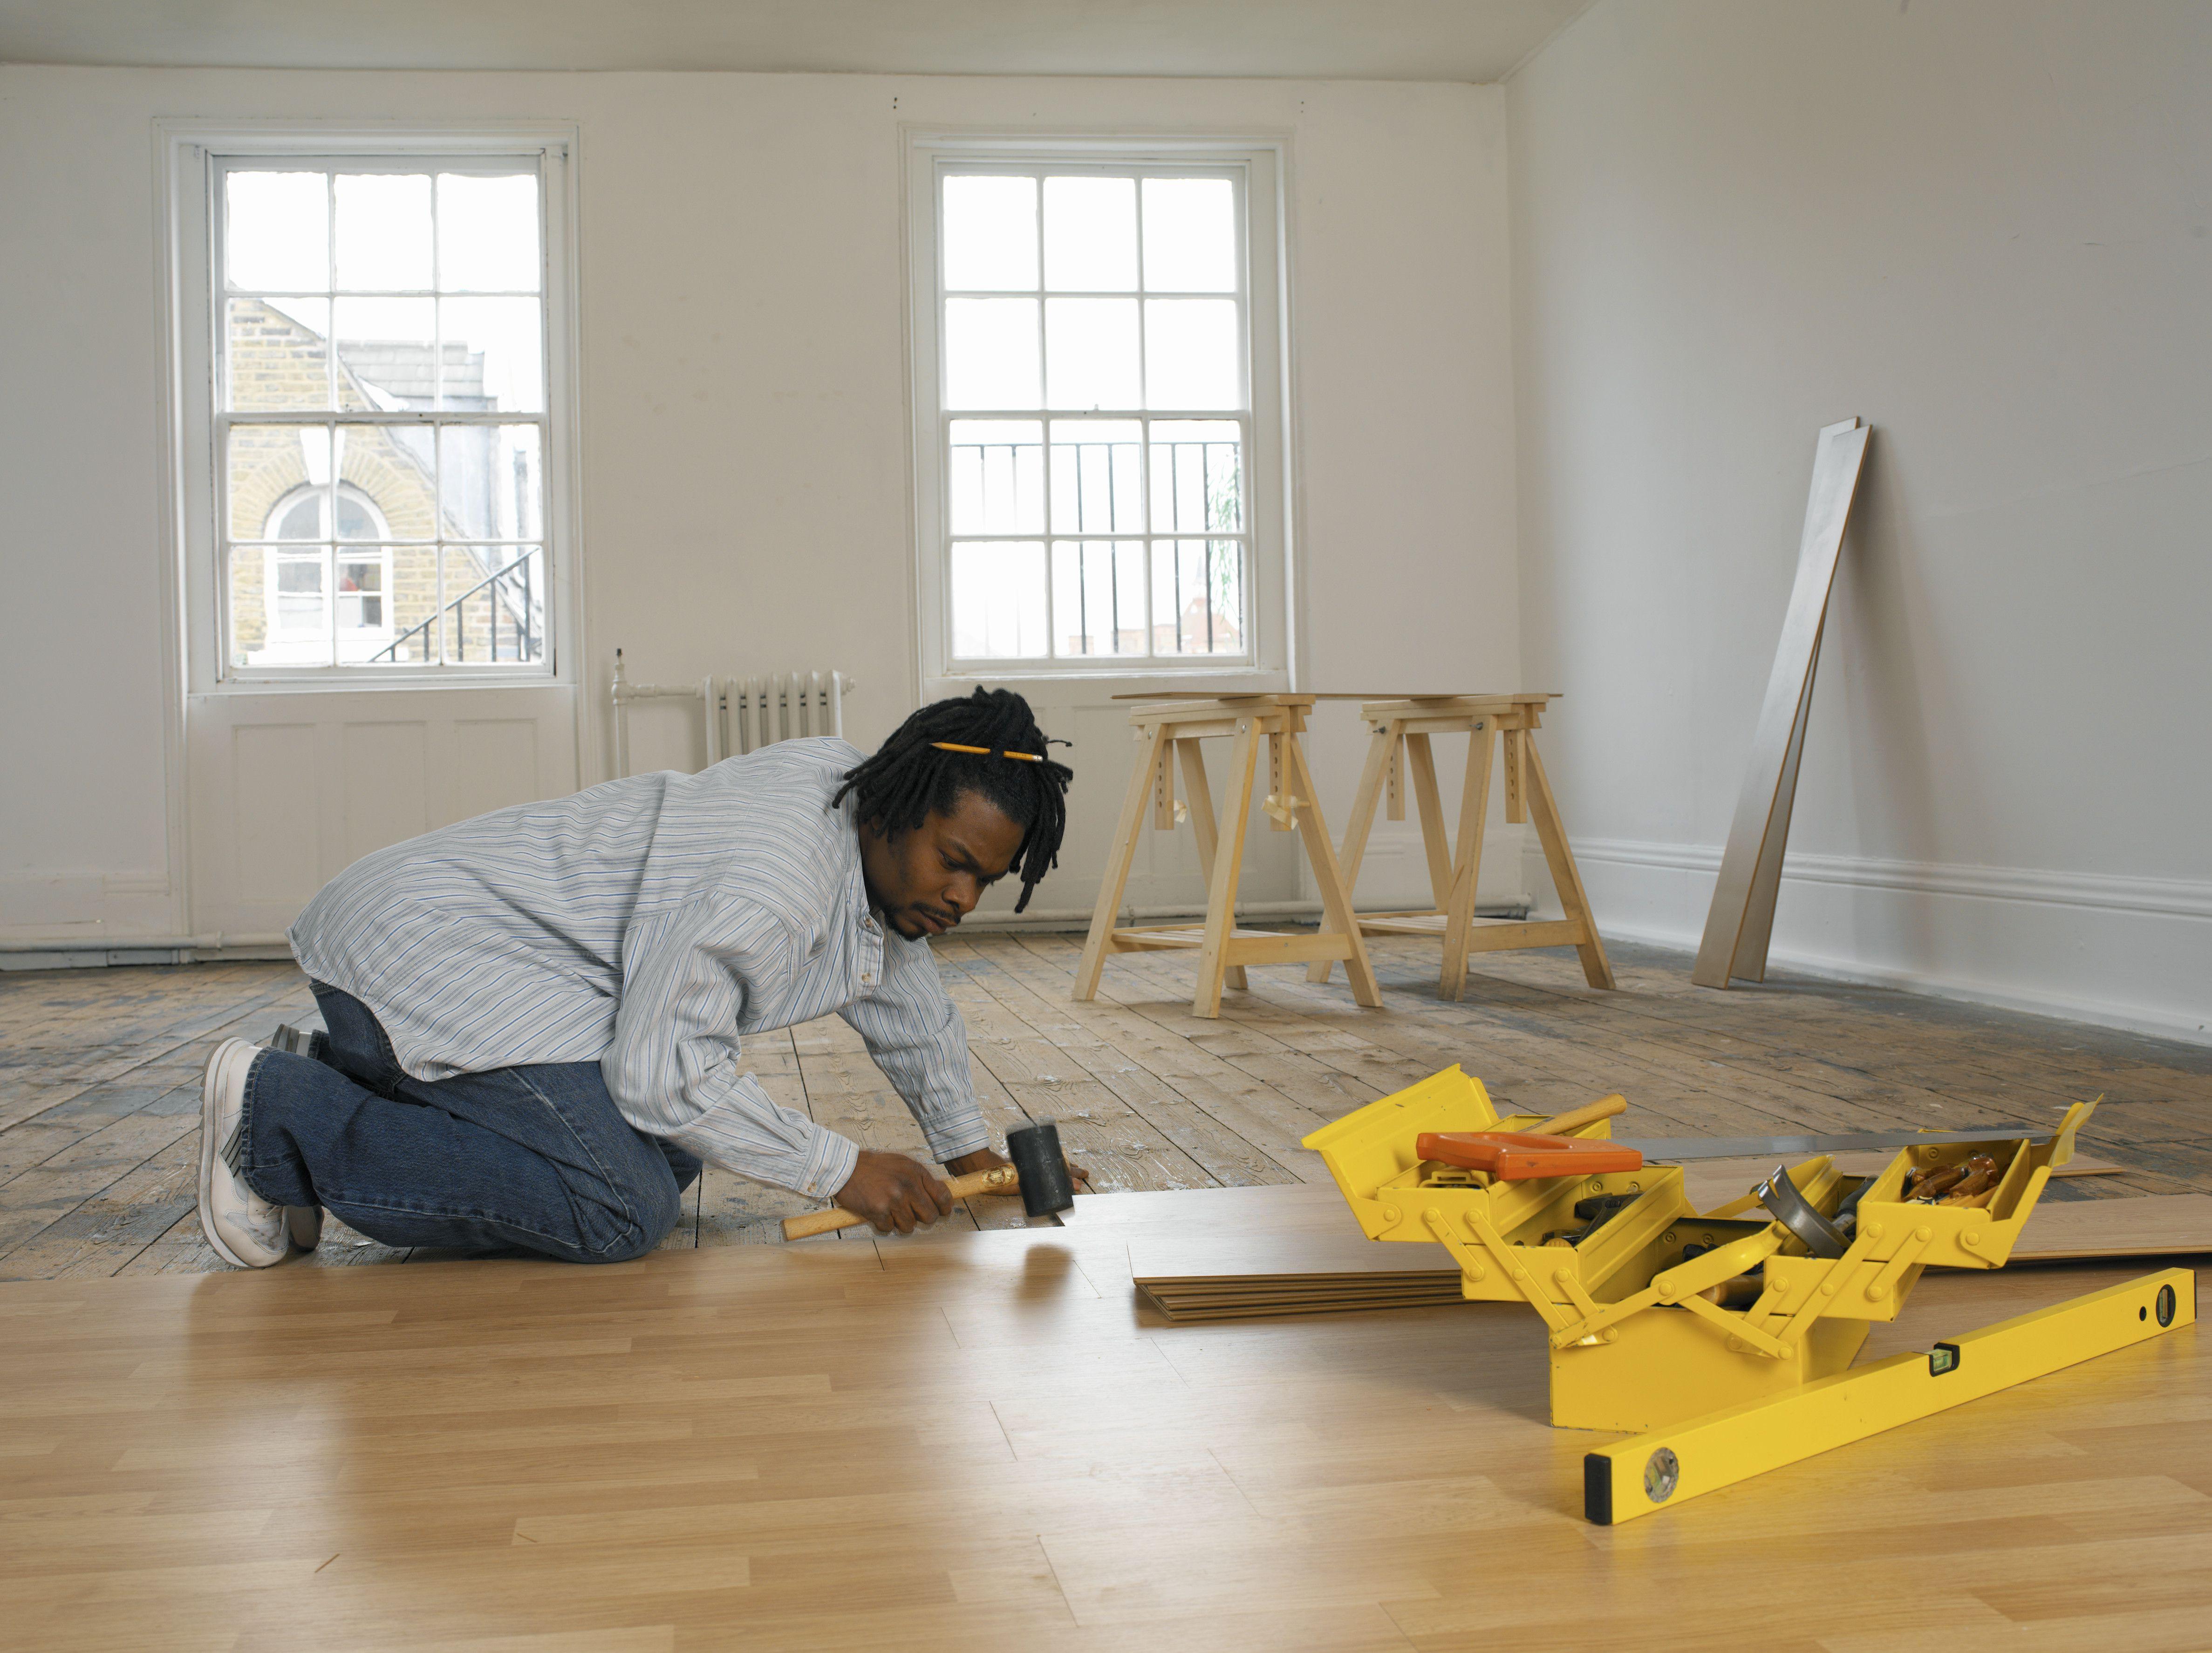 bruce solid oak hardwood flooring reviews of major manufacturing brands for laminate flooring intended for laying laminate flooring